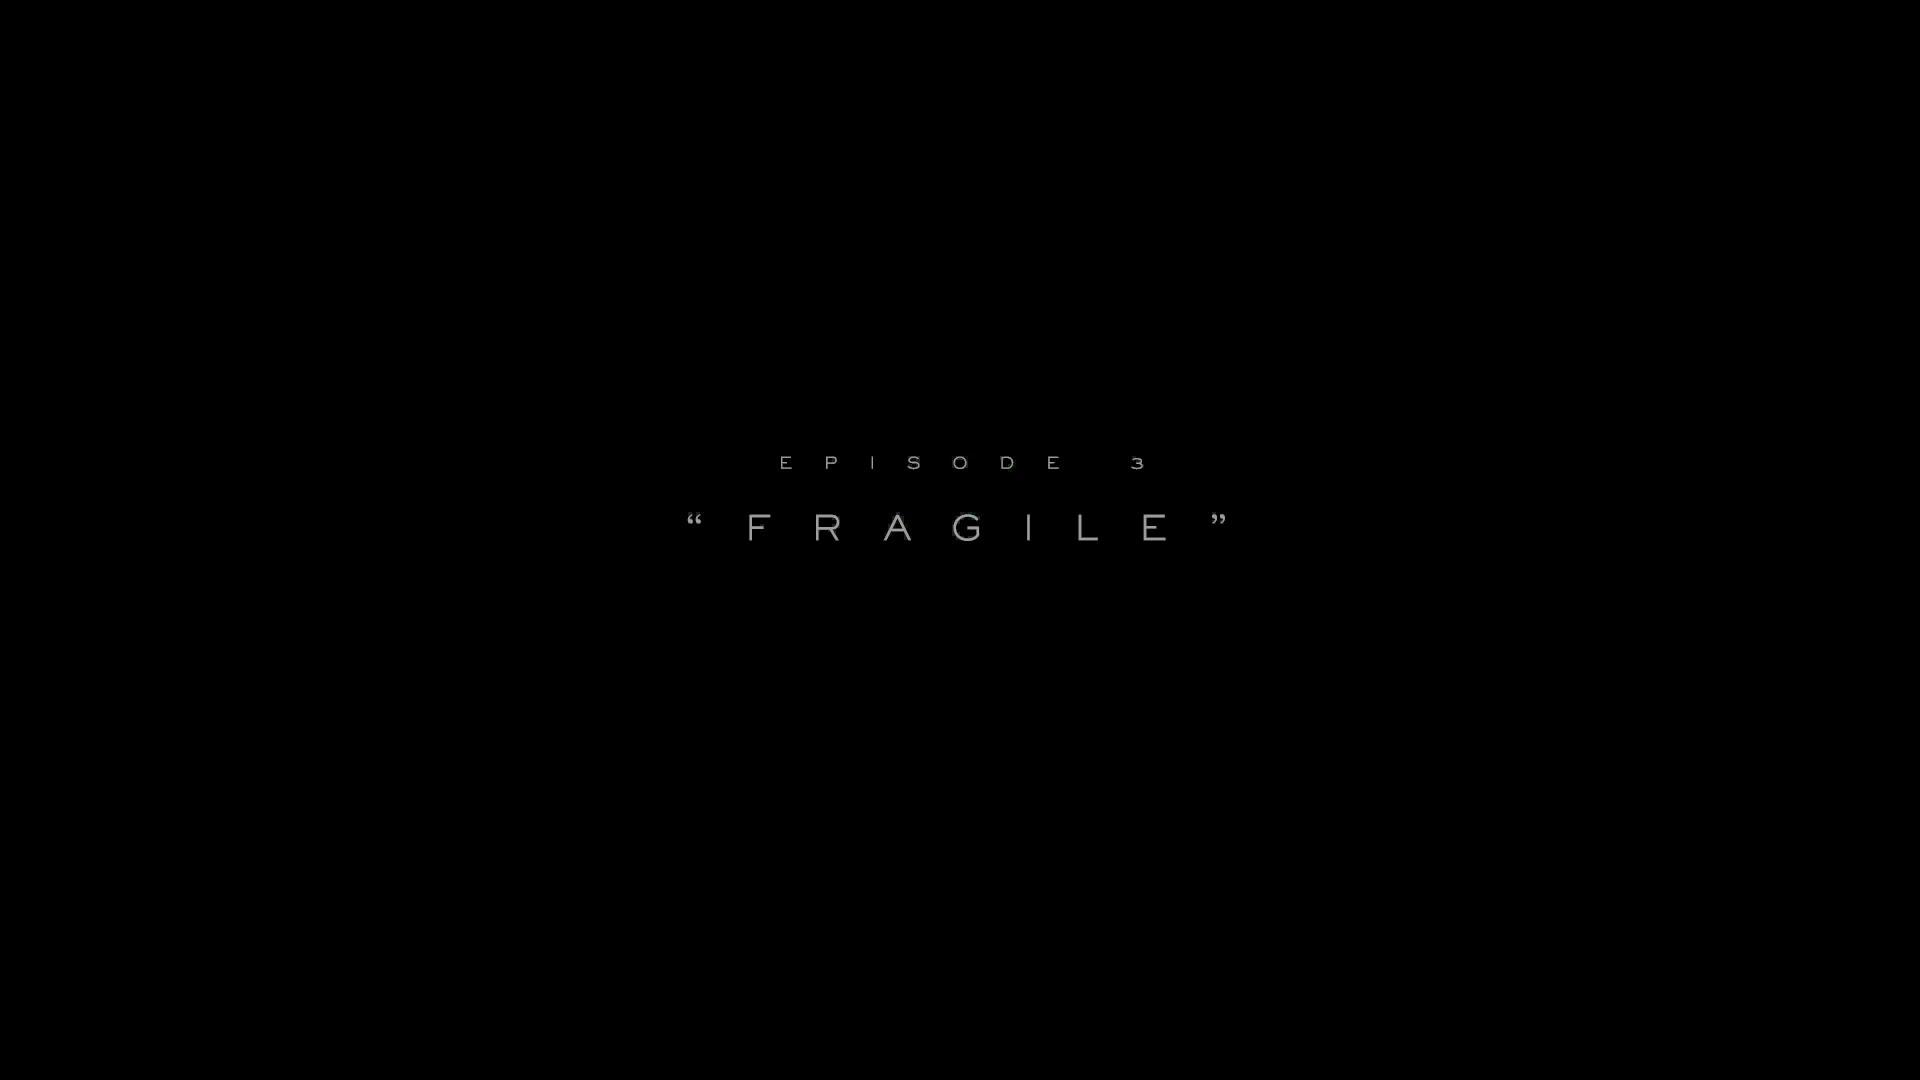 Episode 3: Fragile